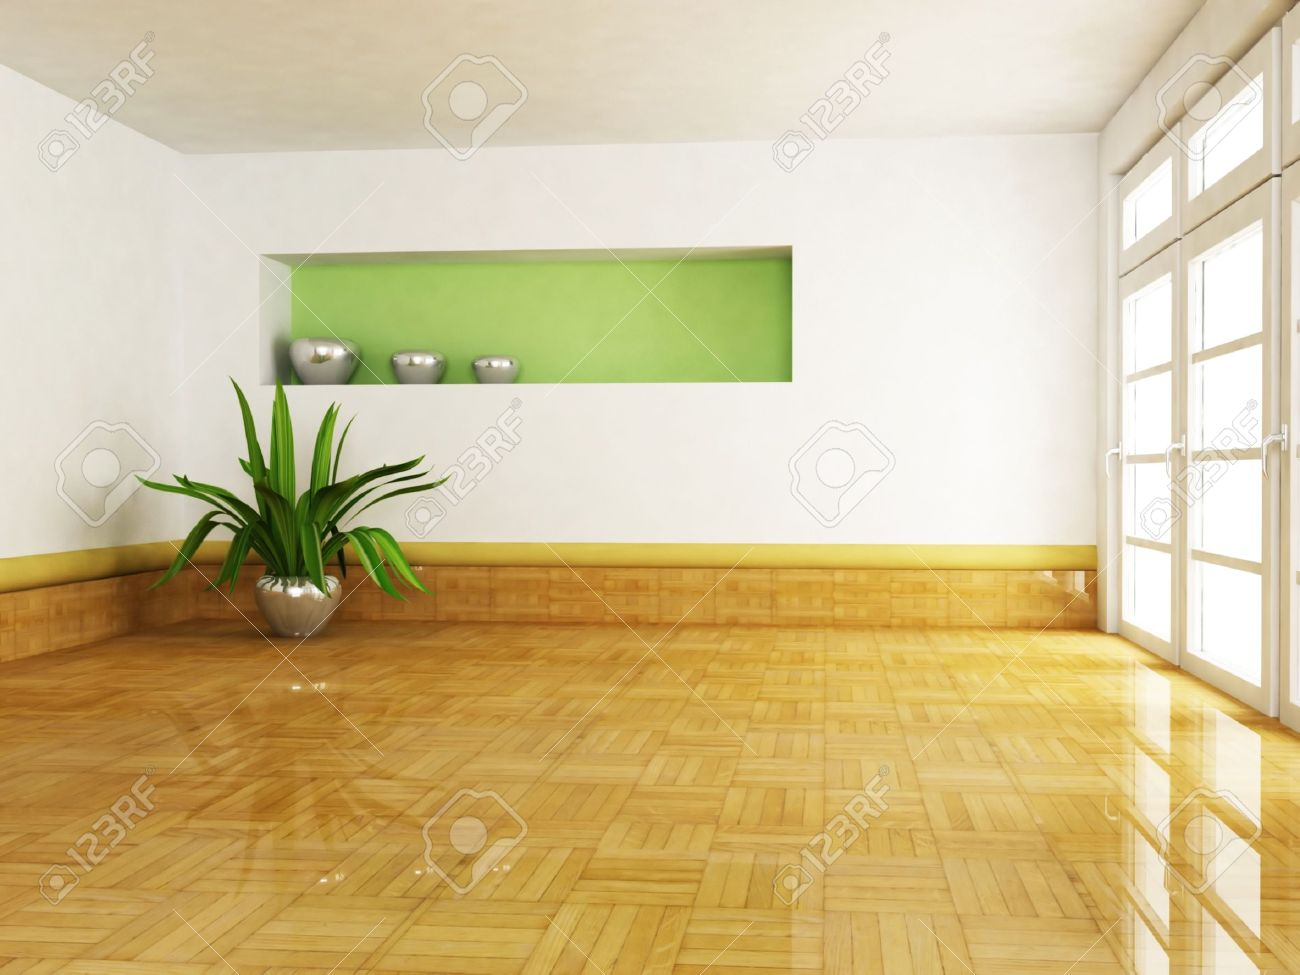 . Interior design scene with a plant in the empty room